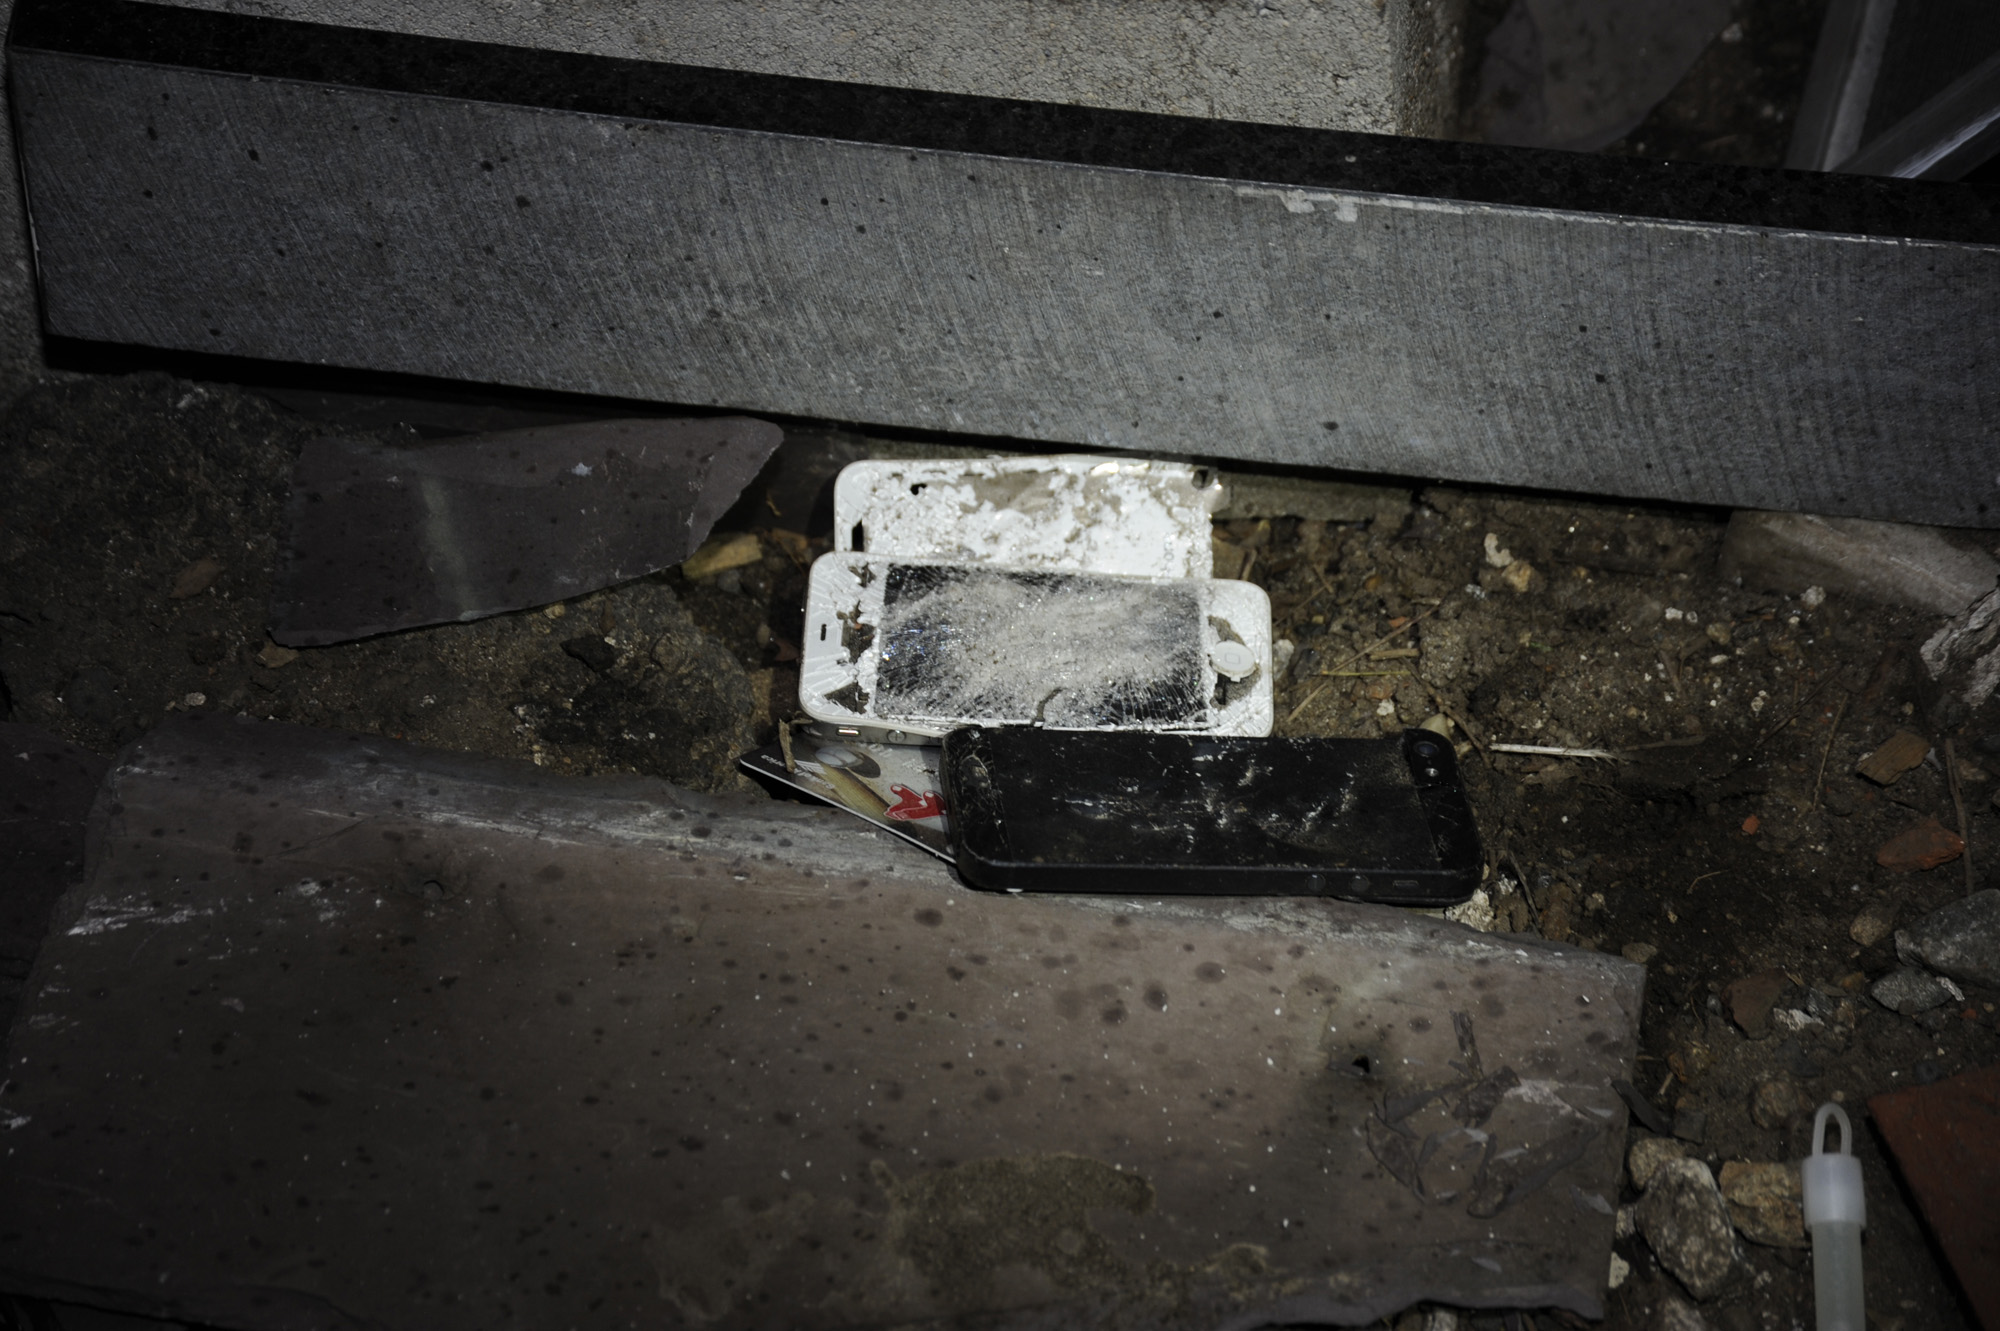 Exh 810 – 06 Smashed phones & ATM card (in situ)